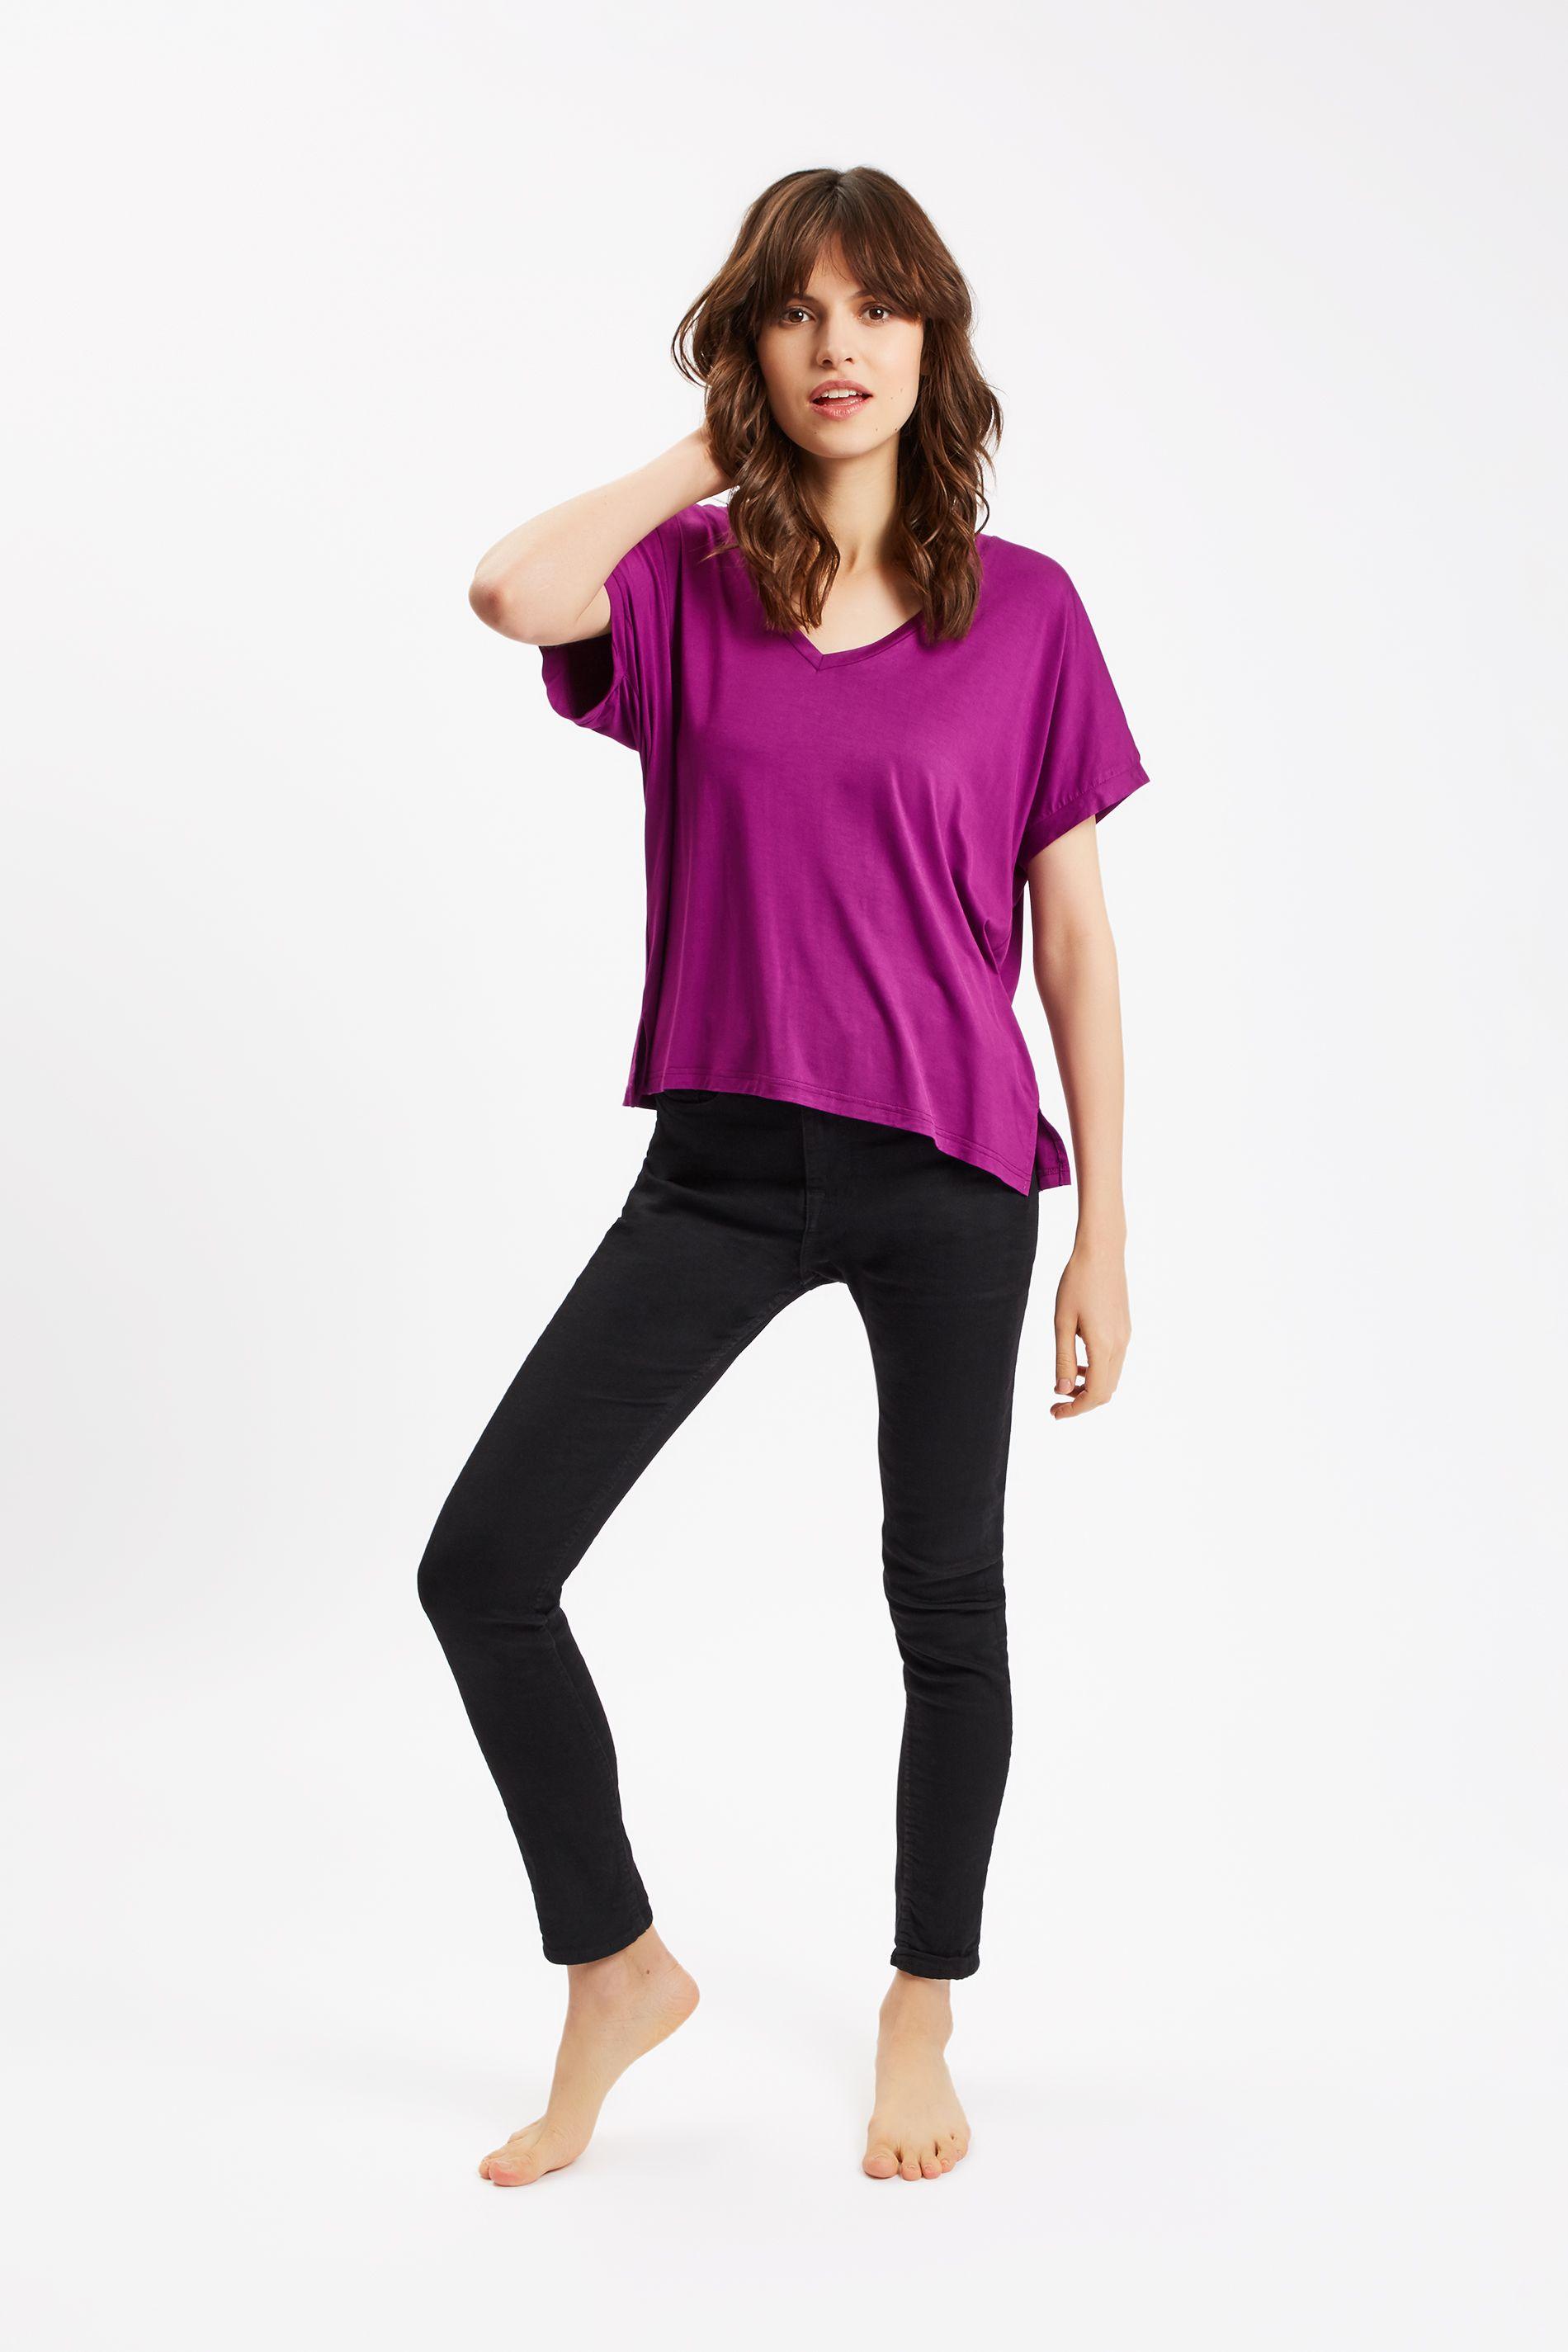 Rainbow Ricochet Short Sleeve T-Shirt in Purple